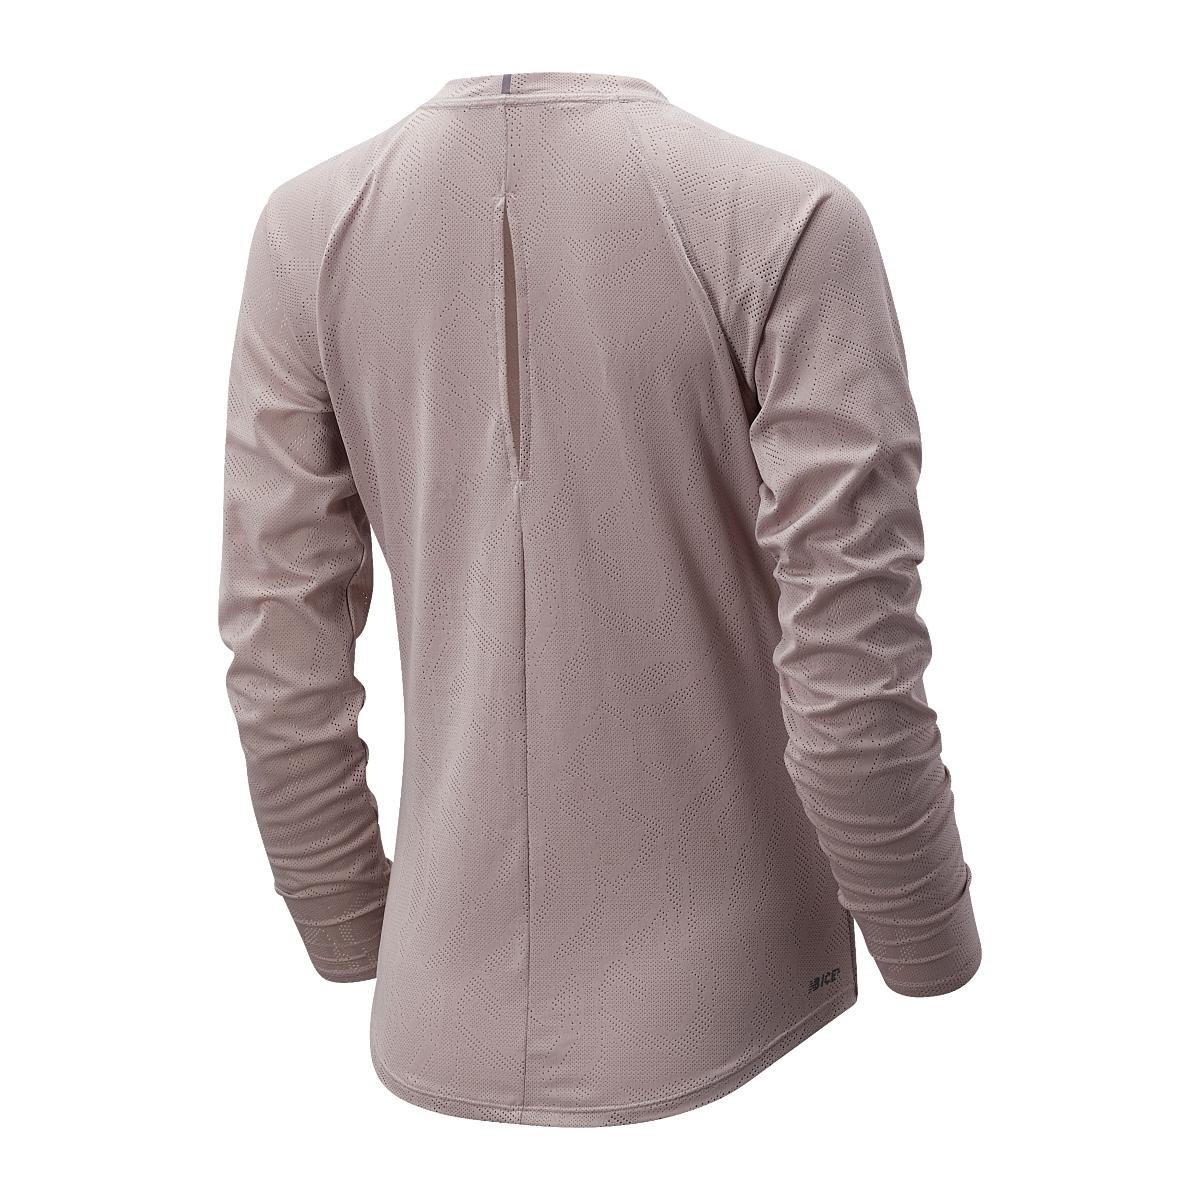 Women's New Balance Q Speed Jacquard Long Sleeve  - Color: Logwood - Size: XS, Logwood, large, image 2